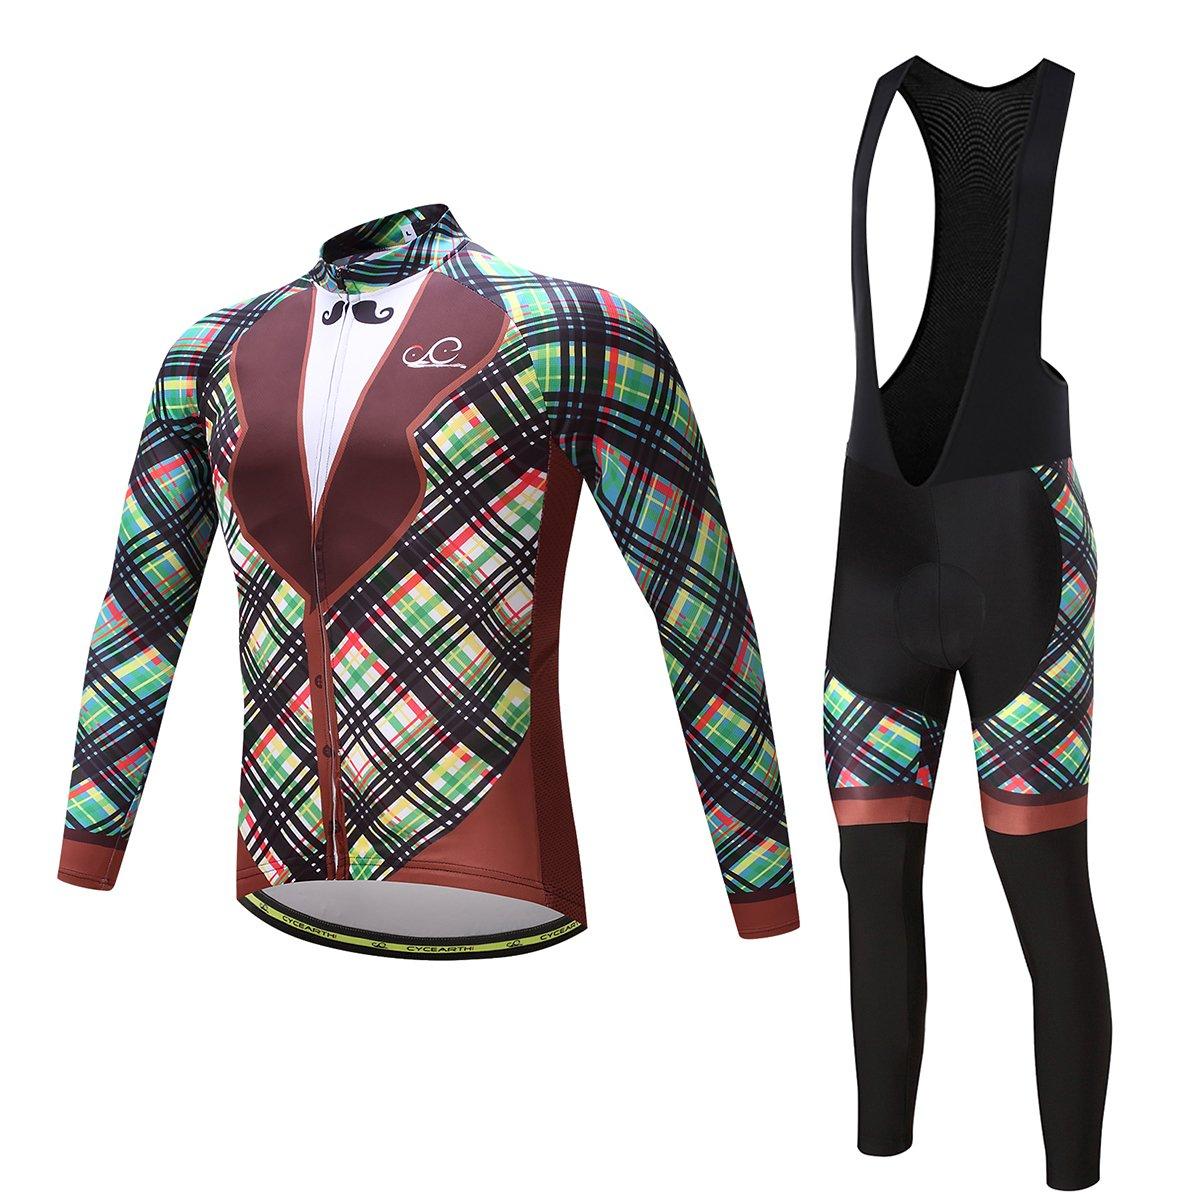 Cycearth Cycling Jersey Long Sleeve Set Men Winter Fleece Thermal Jackets Black Bib Pant (Ce603a, XXL) by Cycearth